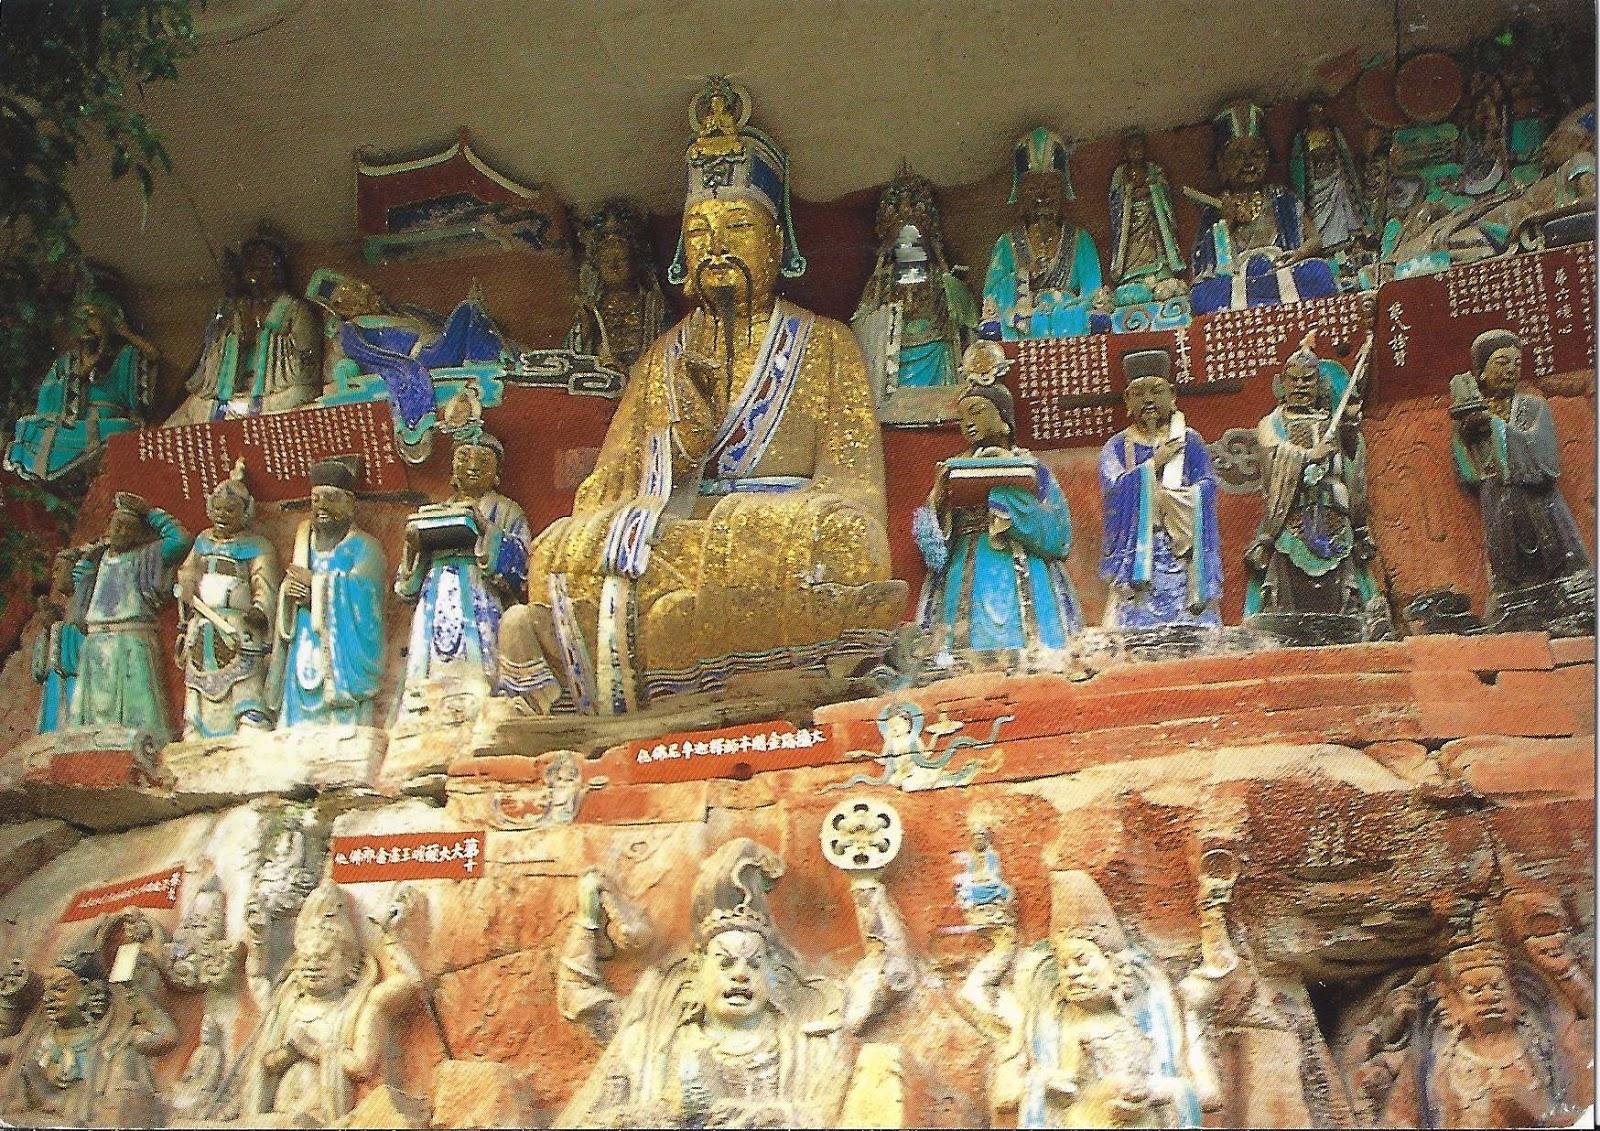 A journey of postcards dazu rock carvings china